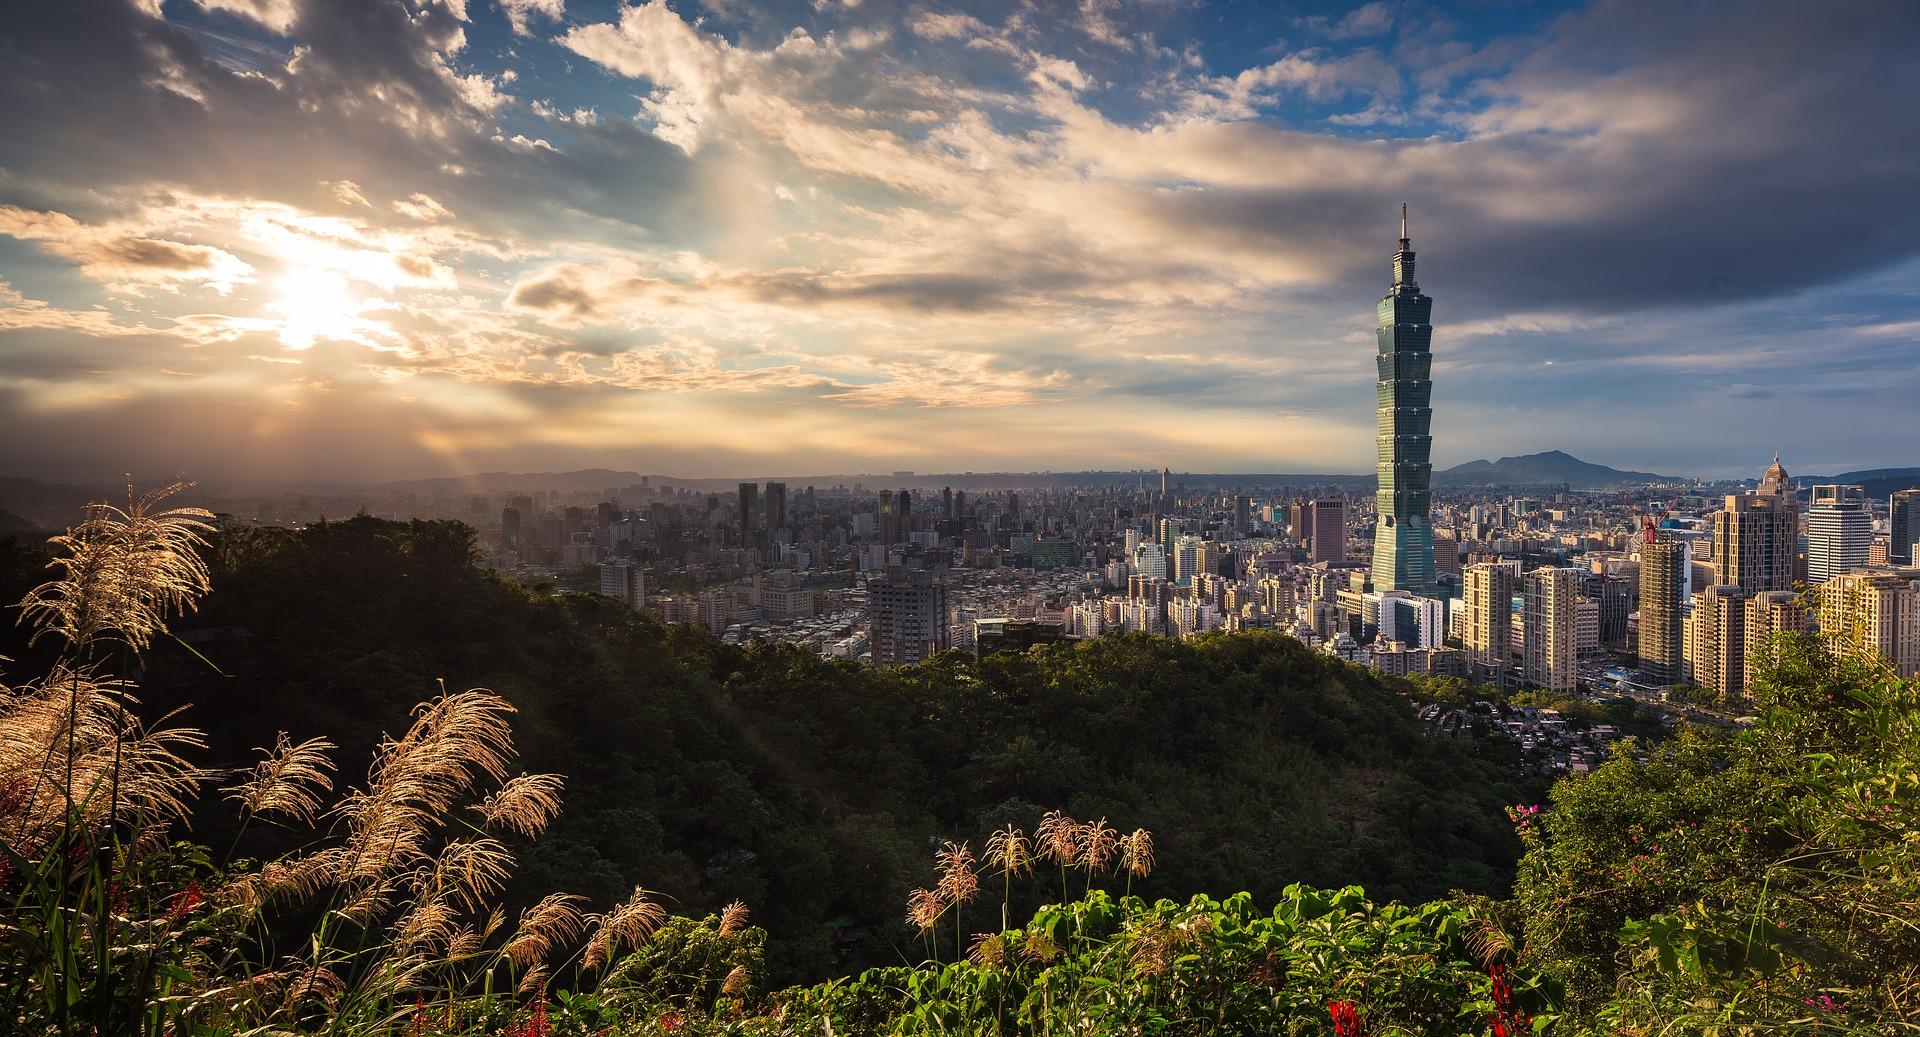 Taiwan-Taipei-Landscape-Mountains